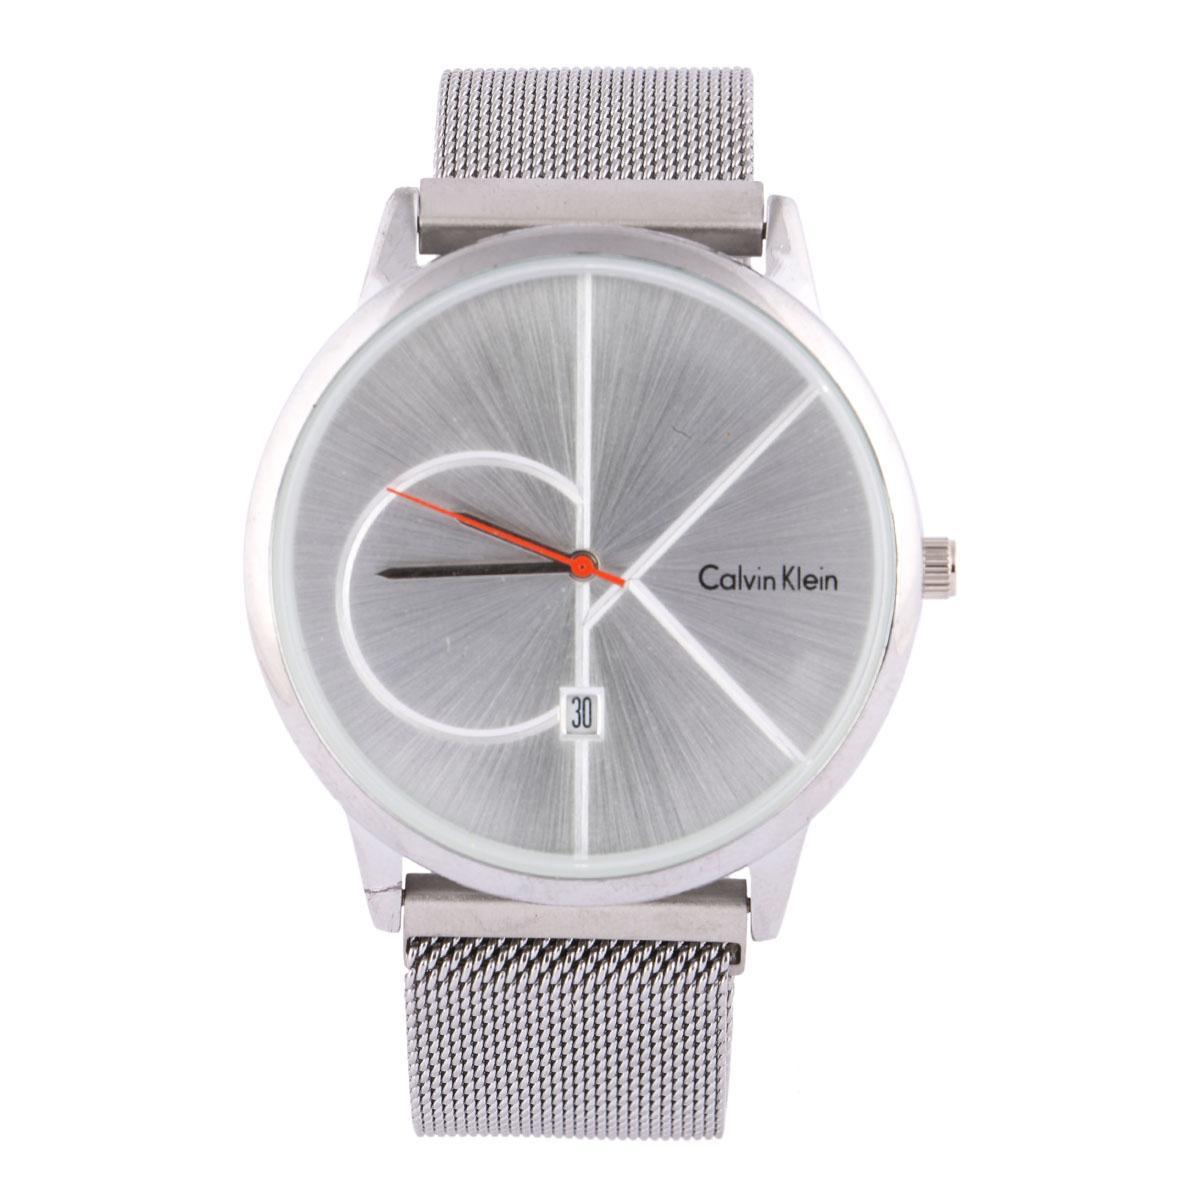 45e29acc7d1 Slim Elegant-looking Calvin Klein Brand Analog Grey Dial Men s Watch With  nice Grey Magnet